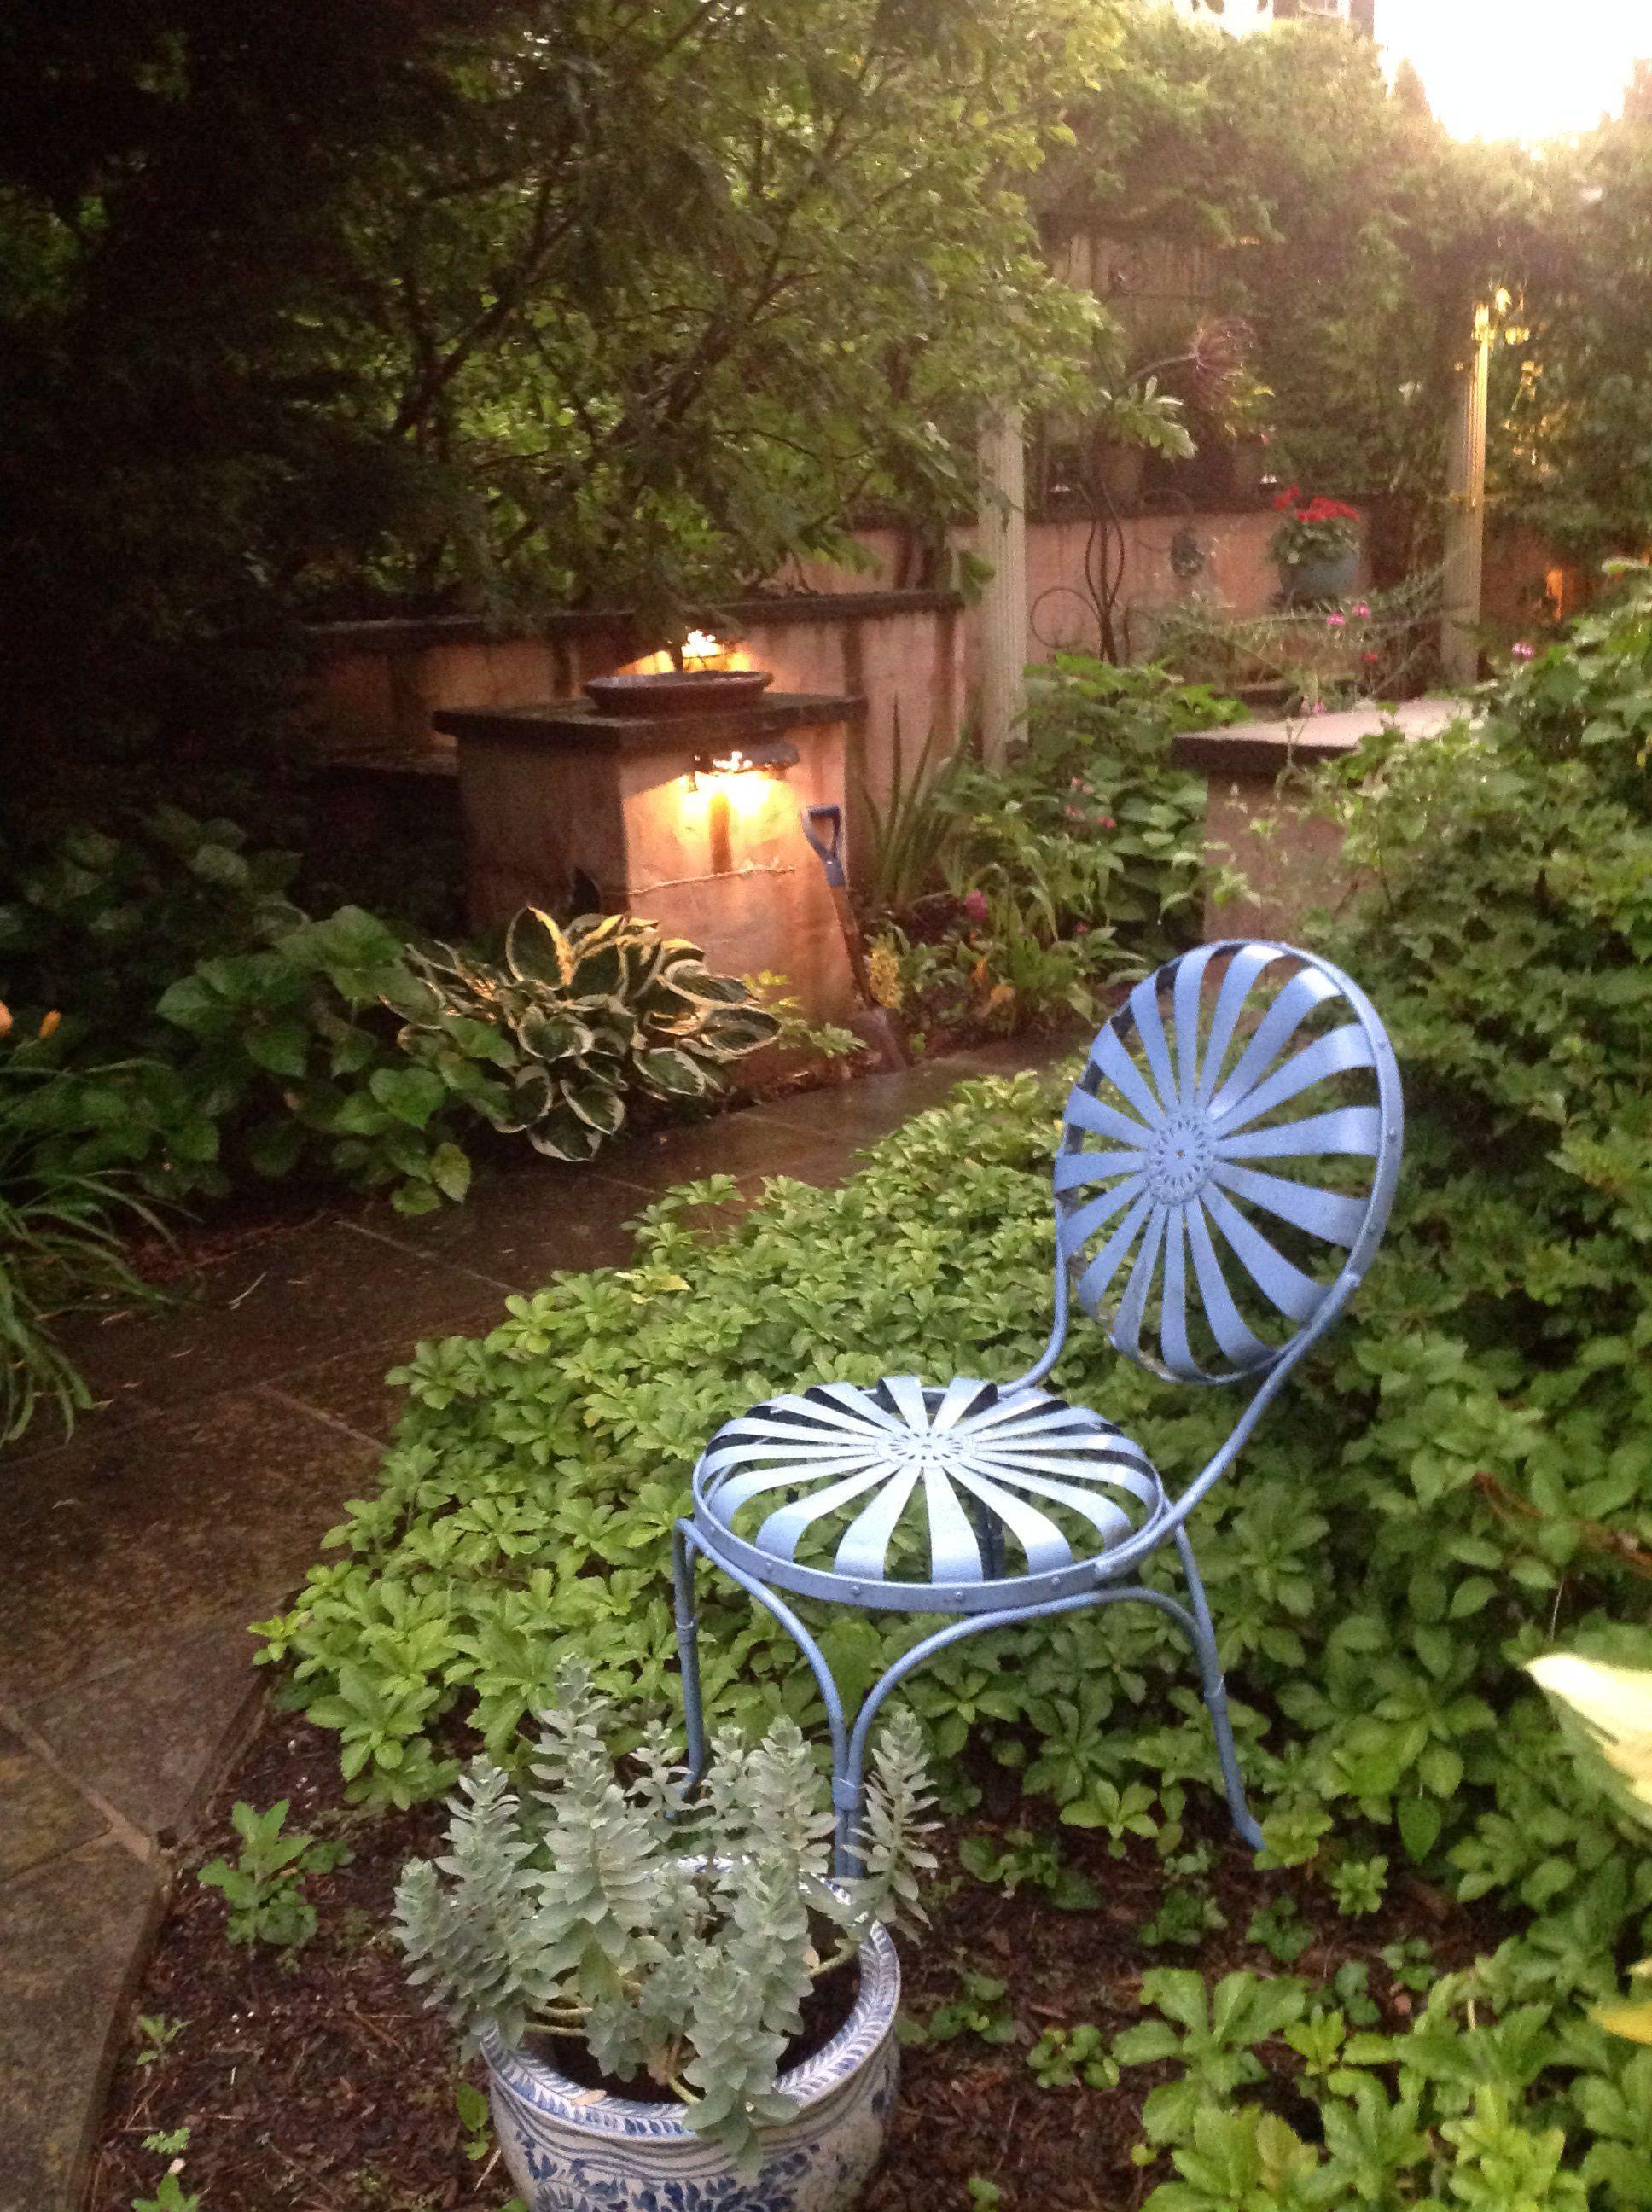 A Garden Symphony in Monet Blue | Monet, Water lilies and Gardens